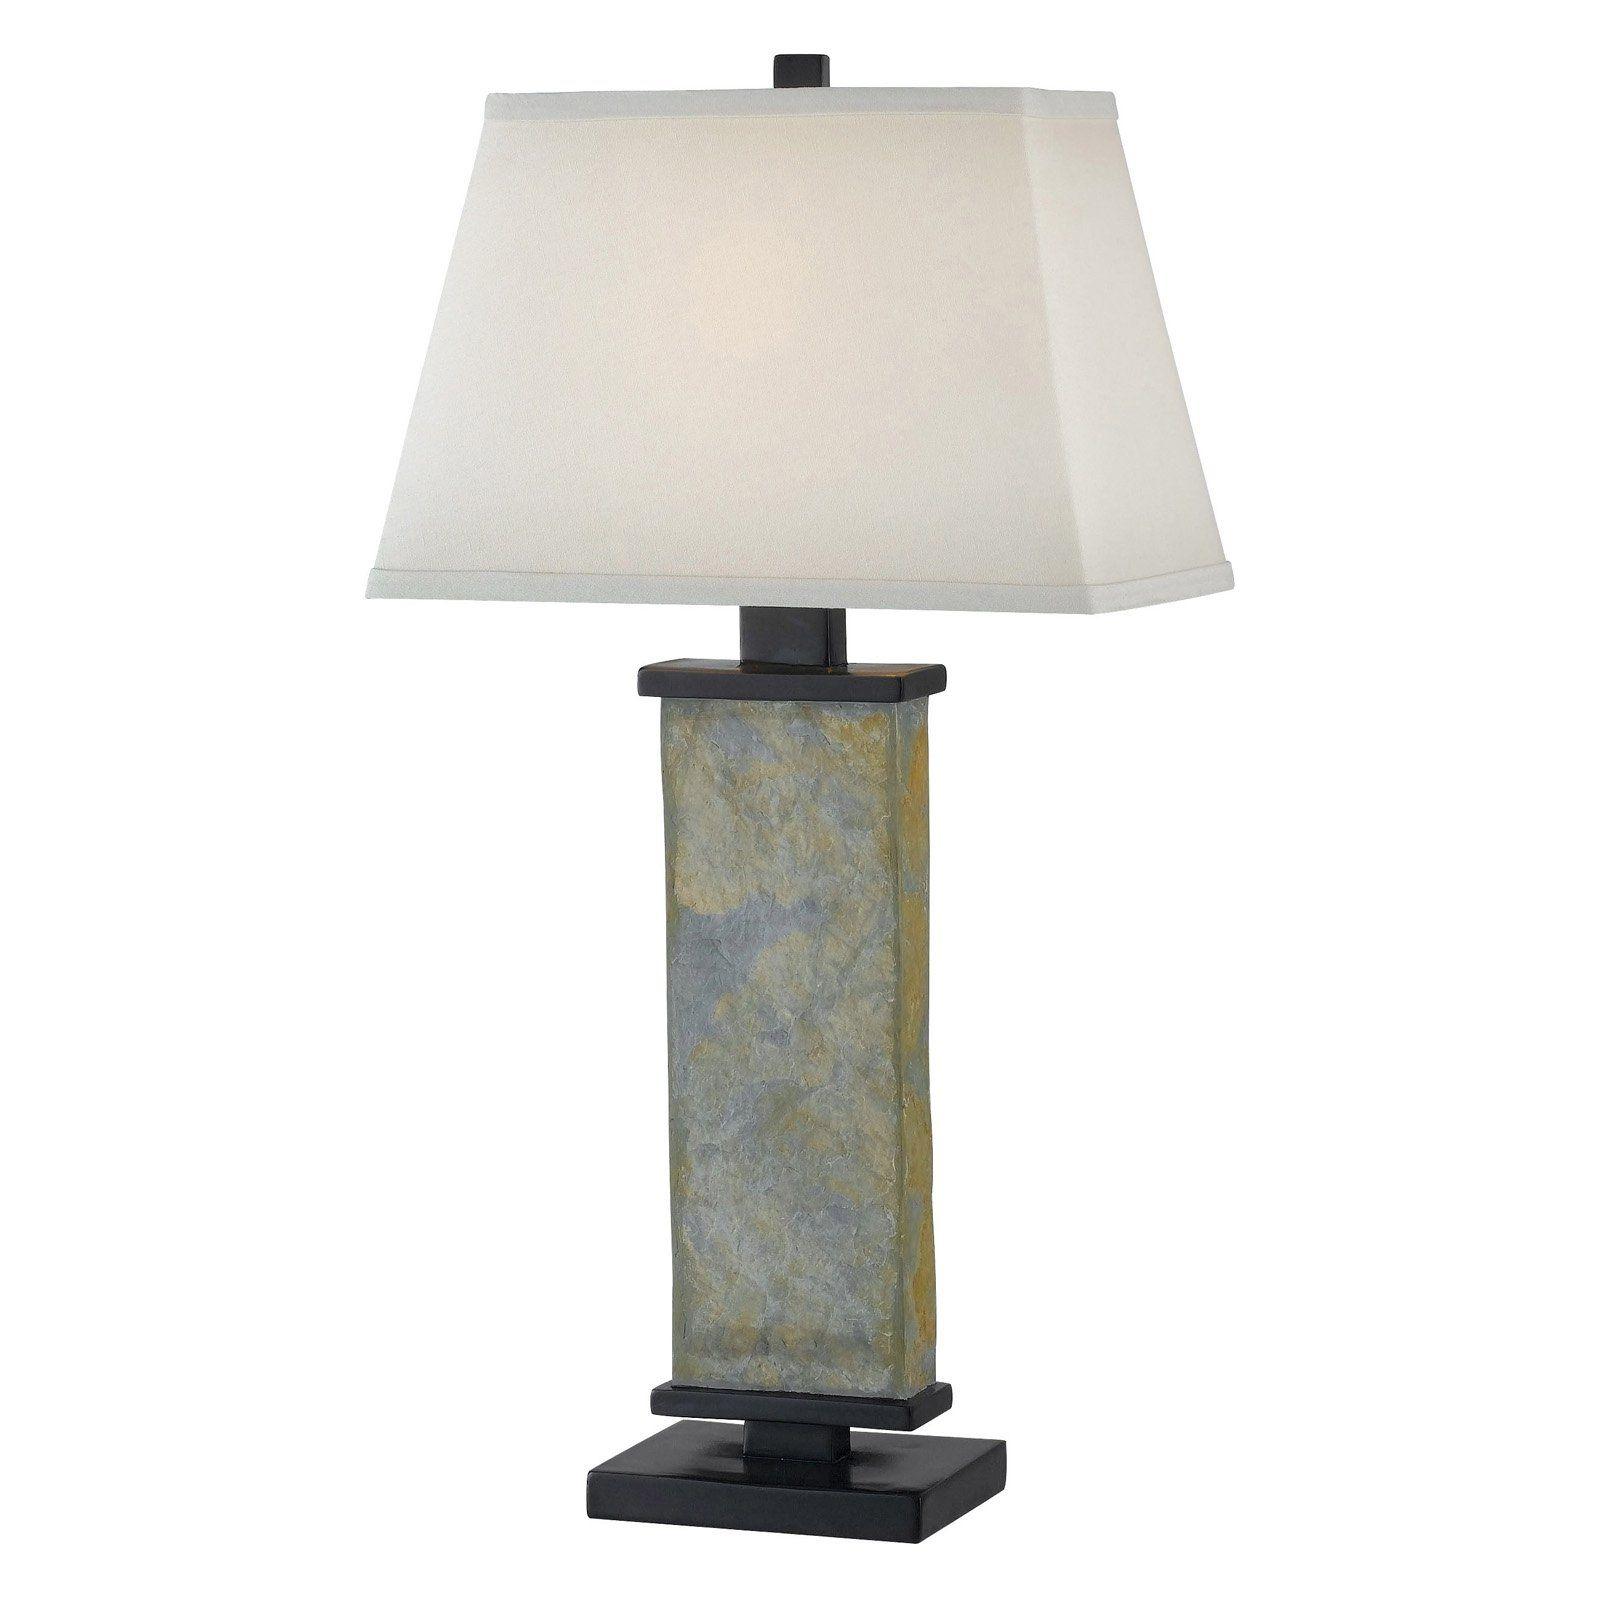 Kenroy Home Hanover Table Lamp Natural Slate Natural Table